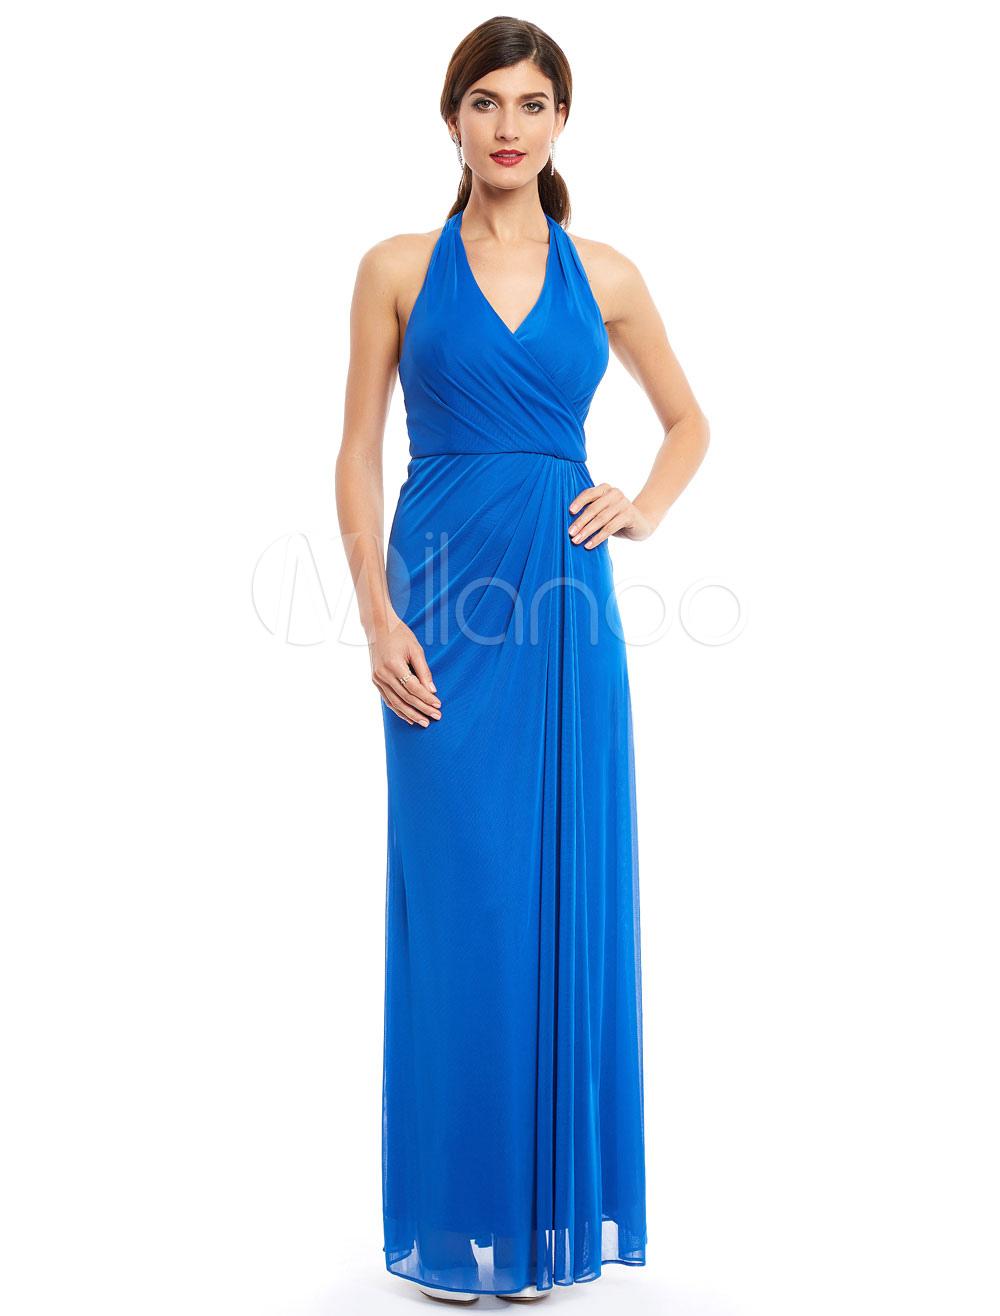 Prom Dresses Long Royal Blue Halter Chiffon Back Design Floor Length Formal Party Dress (Wedding Cheap Party Dress) photo